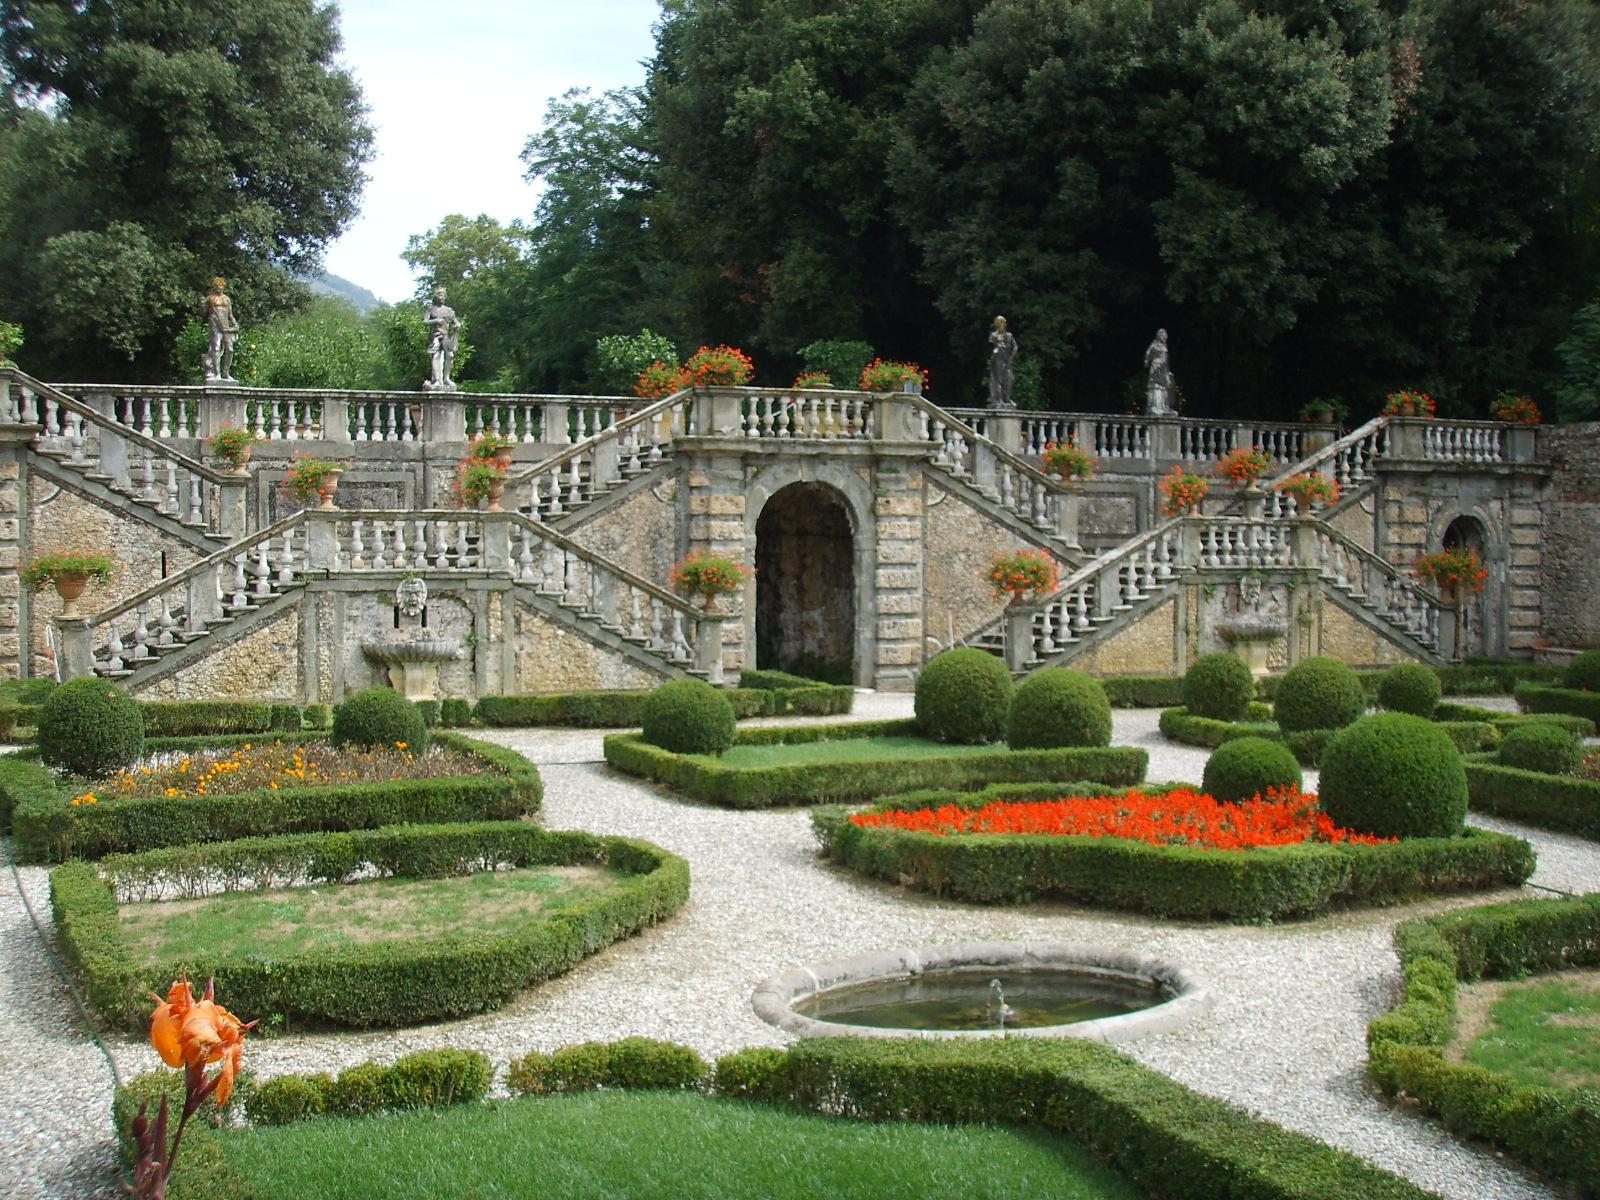 Villa Park Il To Bartlet Il